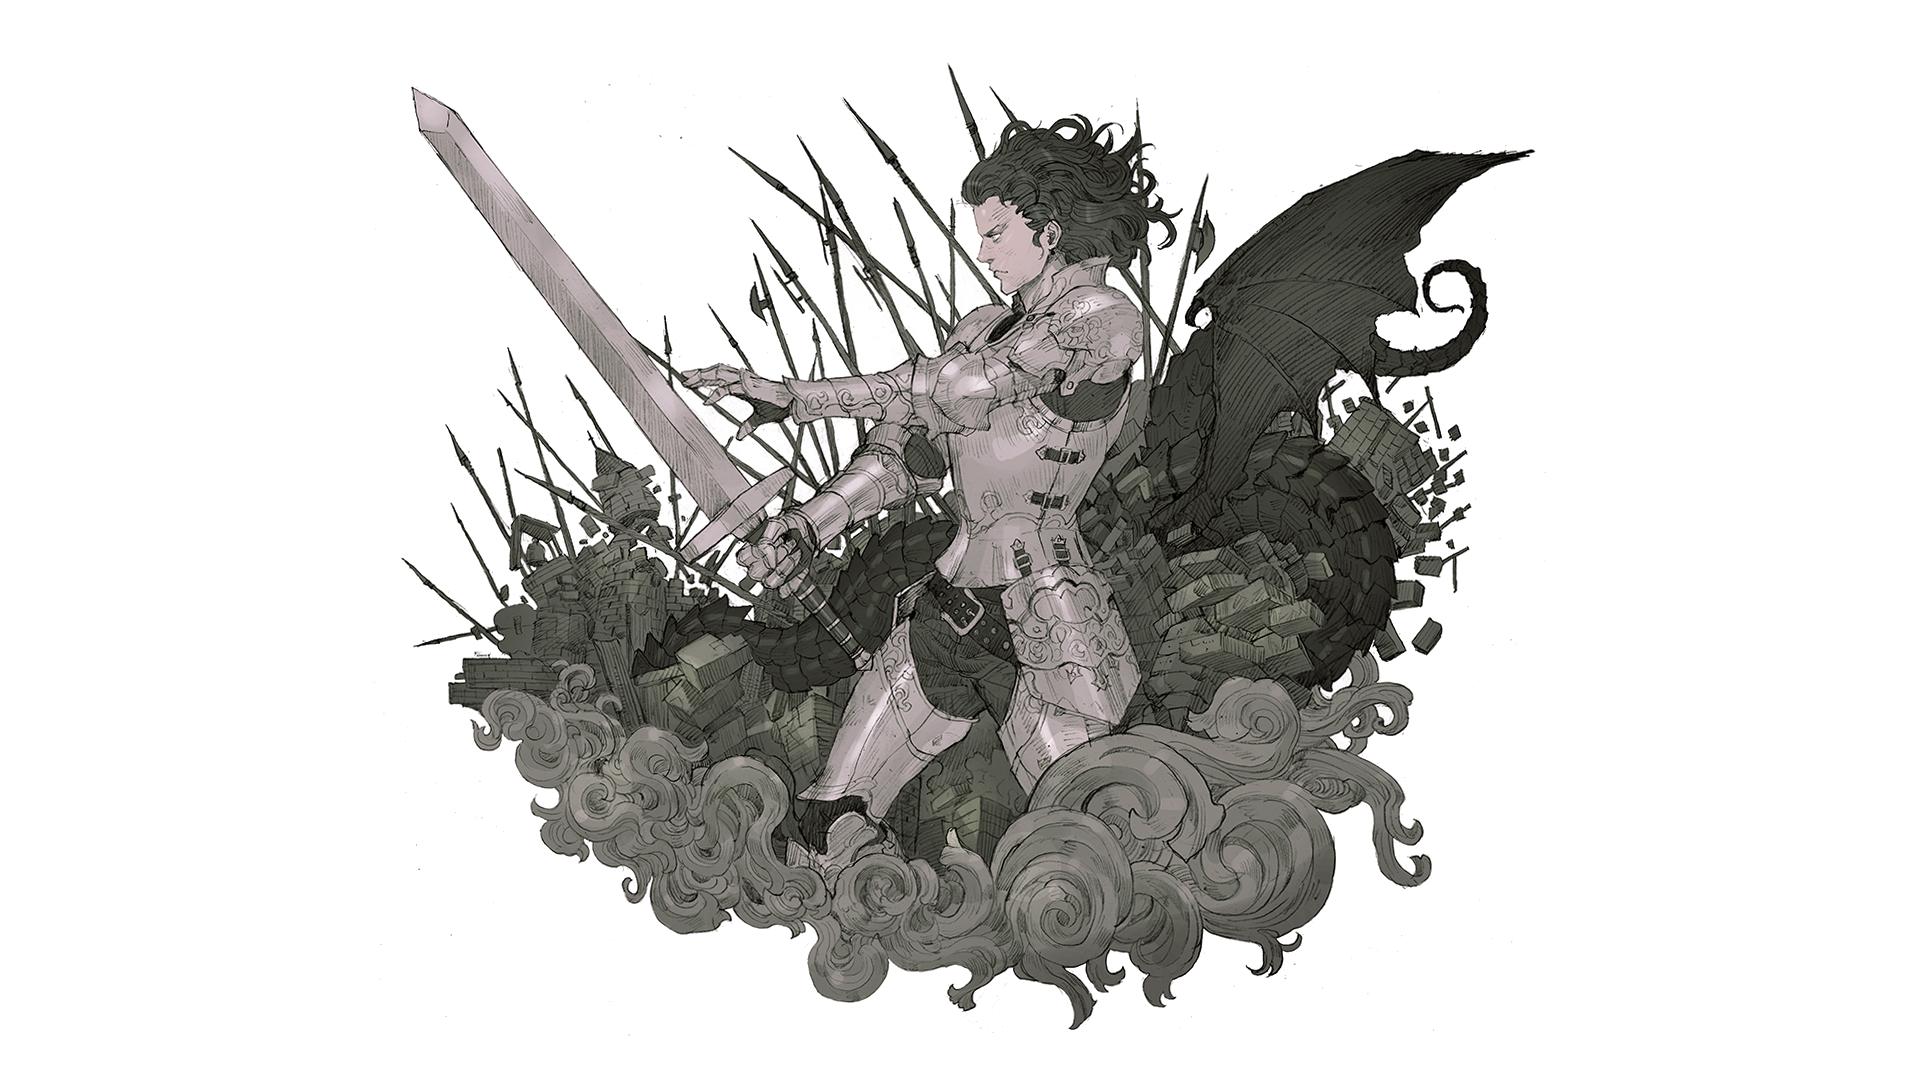 Wallpaper Drawing Illustration Simple Background Anime War